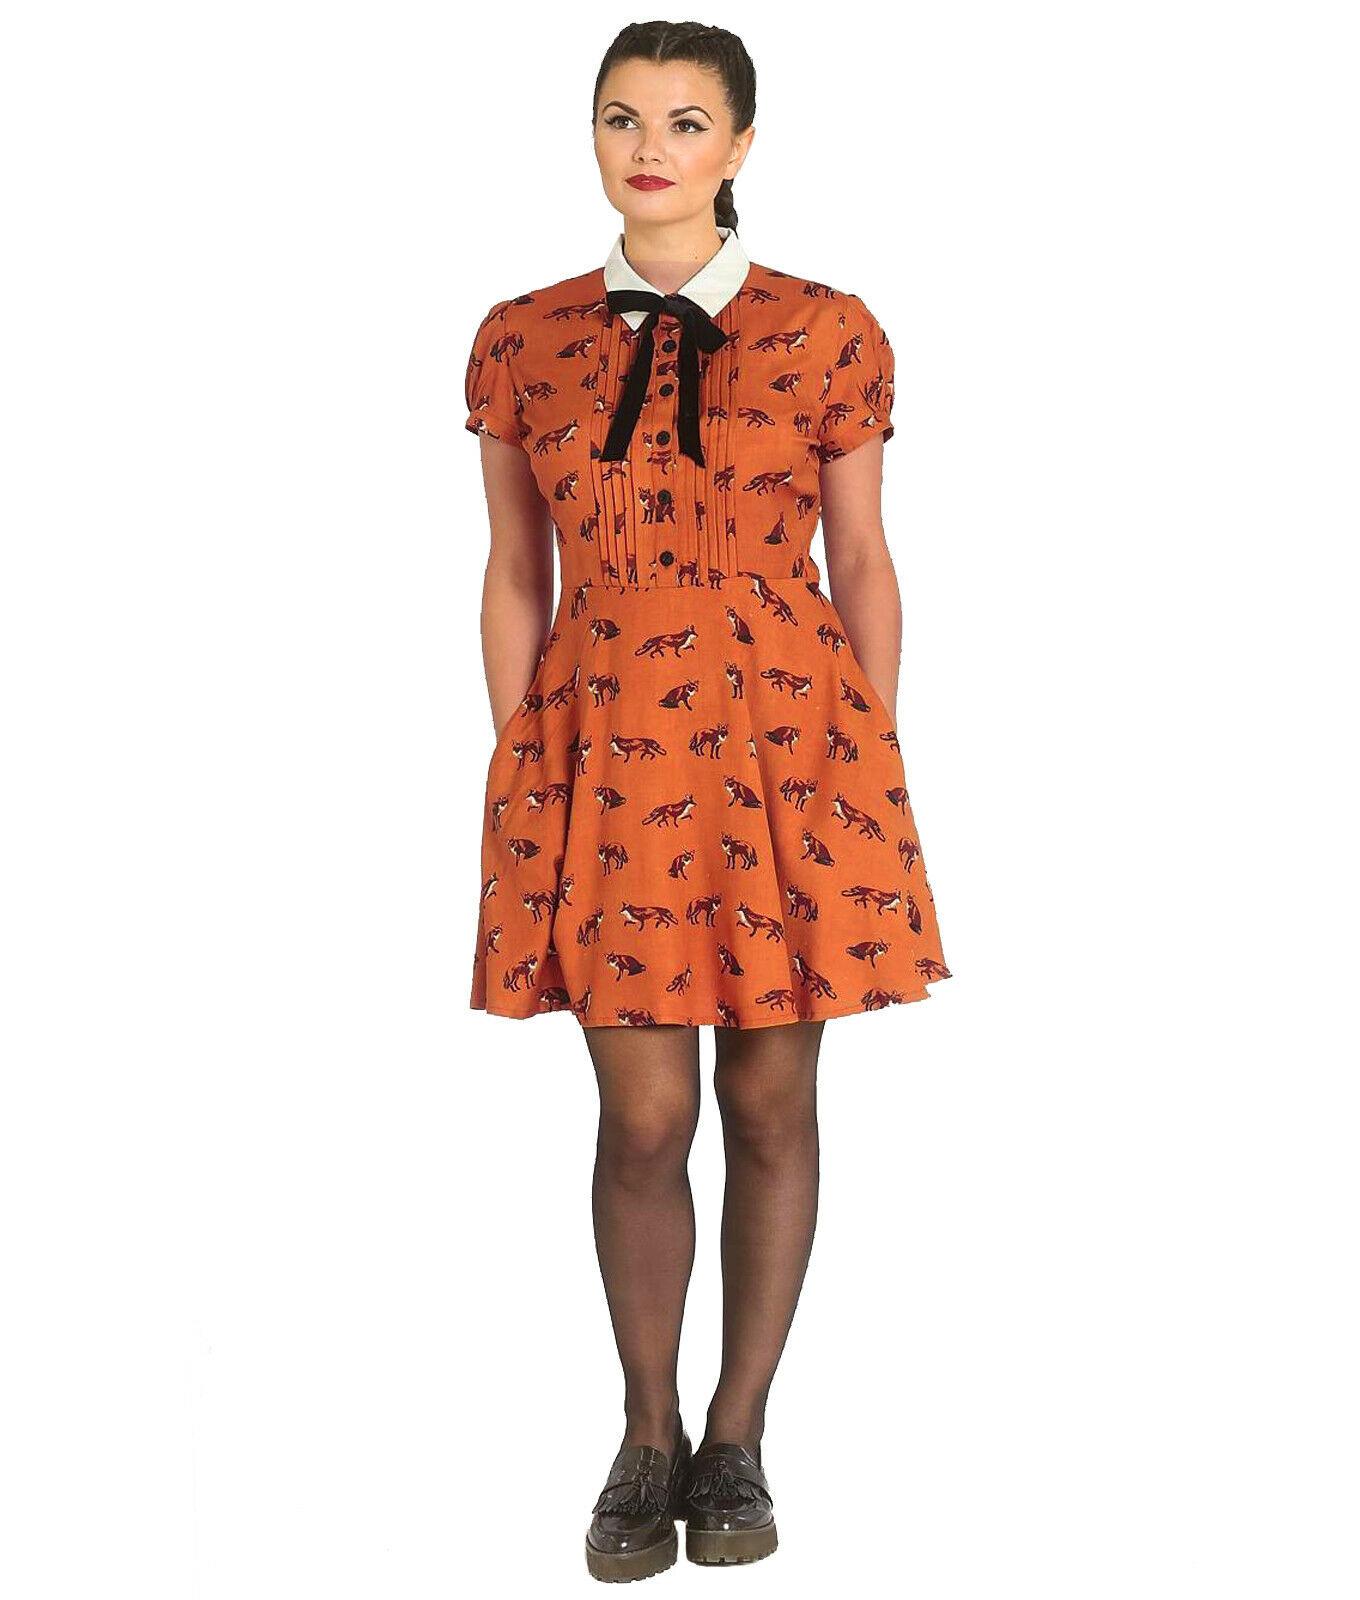 Hell-Bunny-40s-50s-Brown-Mini-Dress-Pin-Up-VIXEY-Vixen-Fox-Print-All-Sizes thumbnail 13